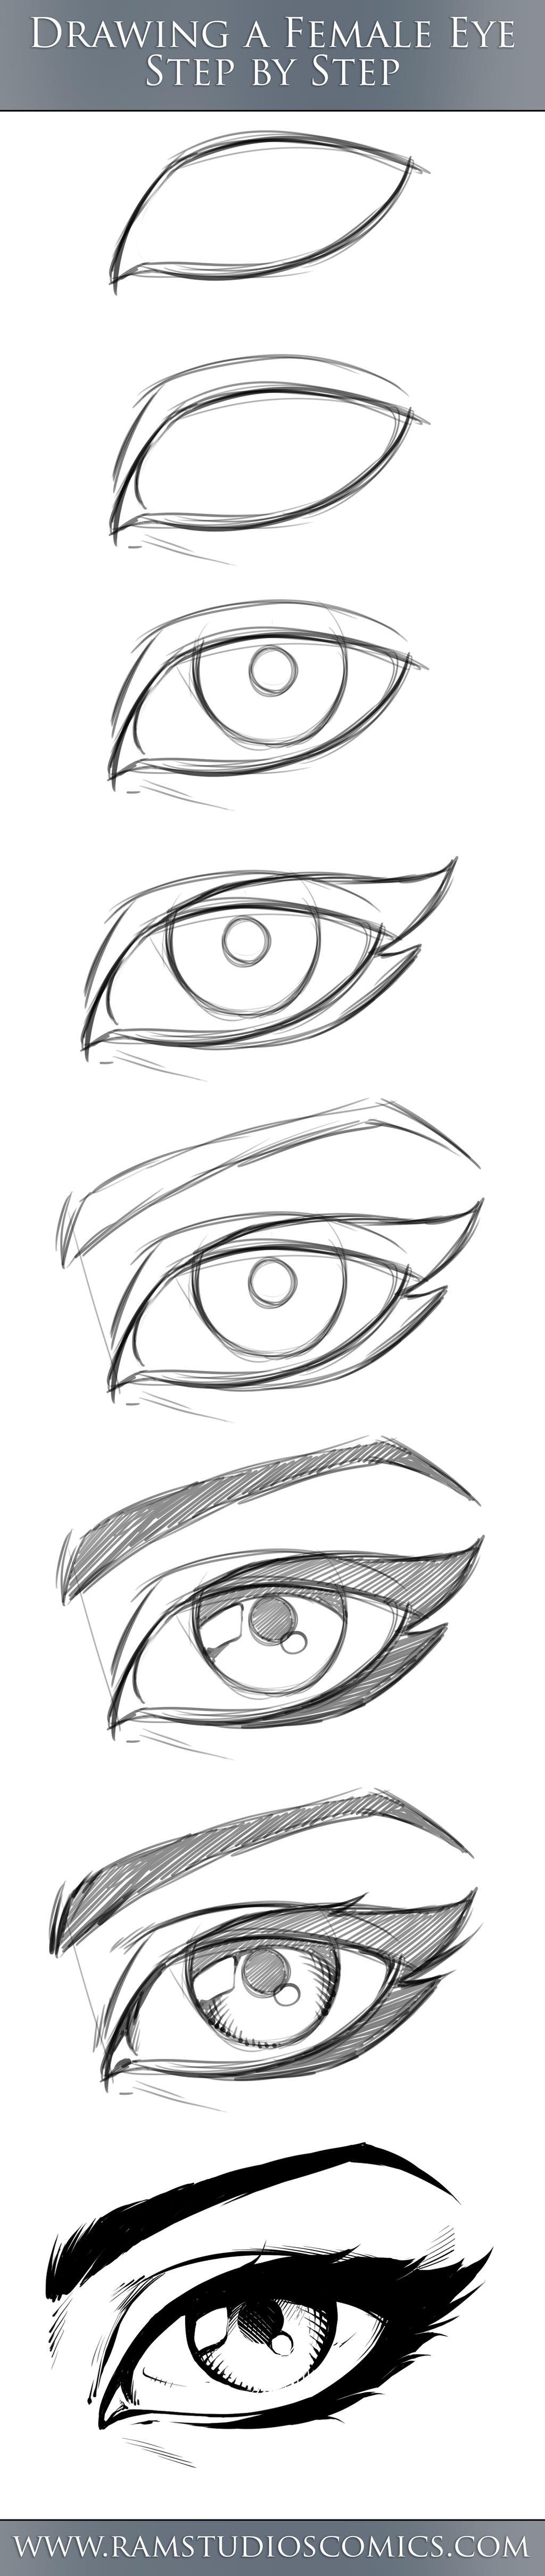 Tutorial body eyes manga chibi cartoon on drawing tutorial nagaia 161 16 female comic eye tutorial step by step by robertmarzullo ccuart Choice Image